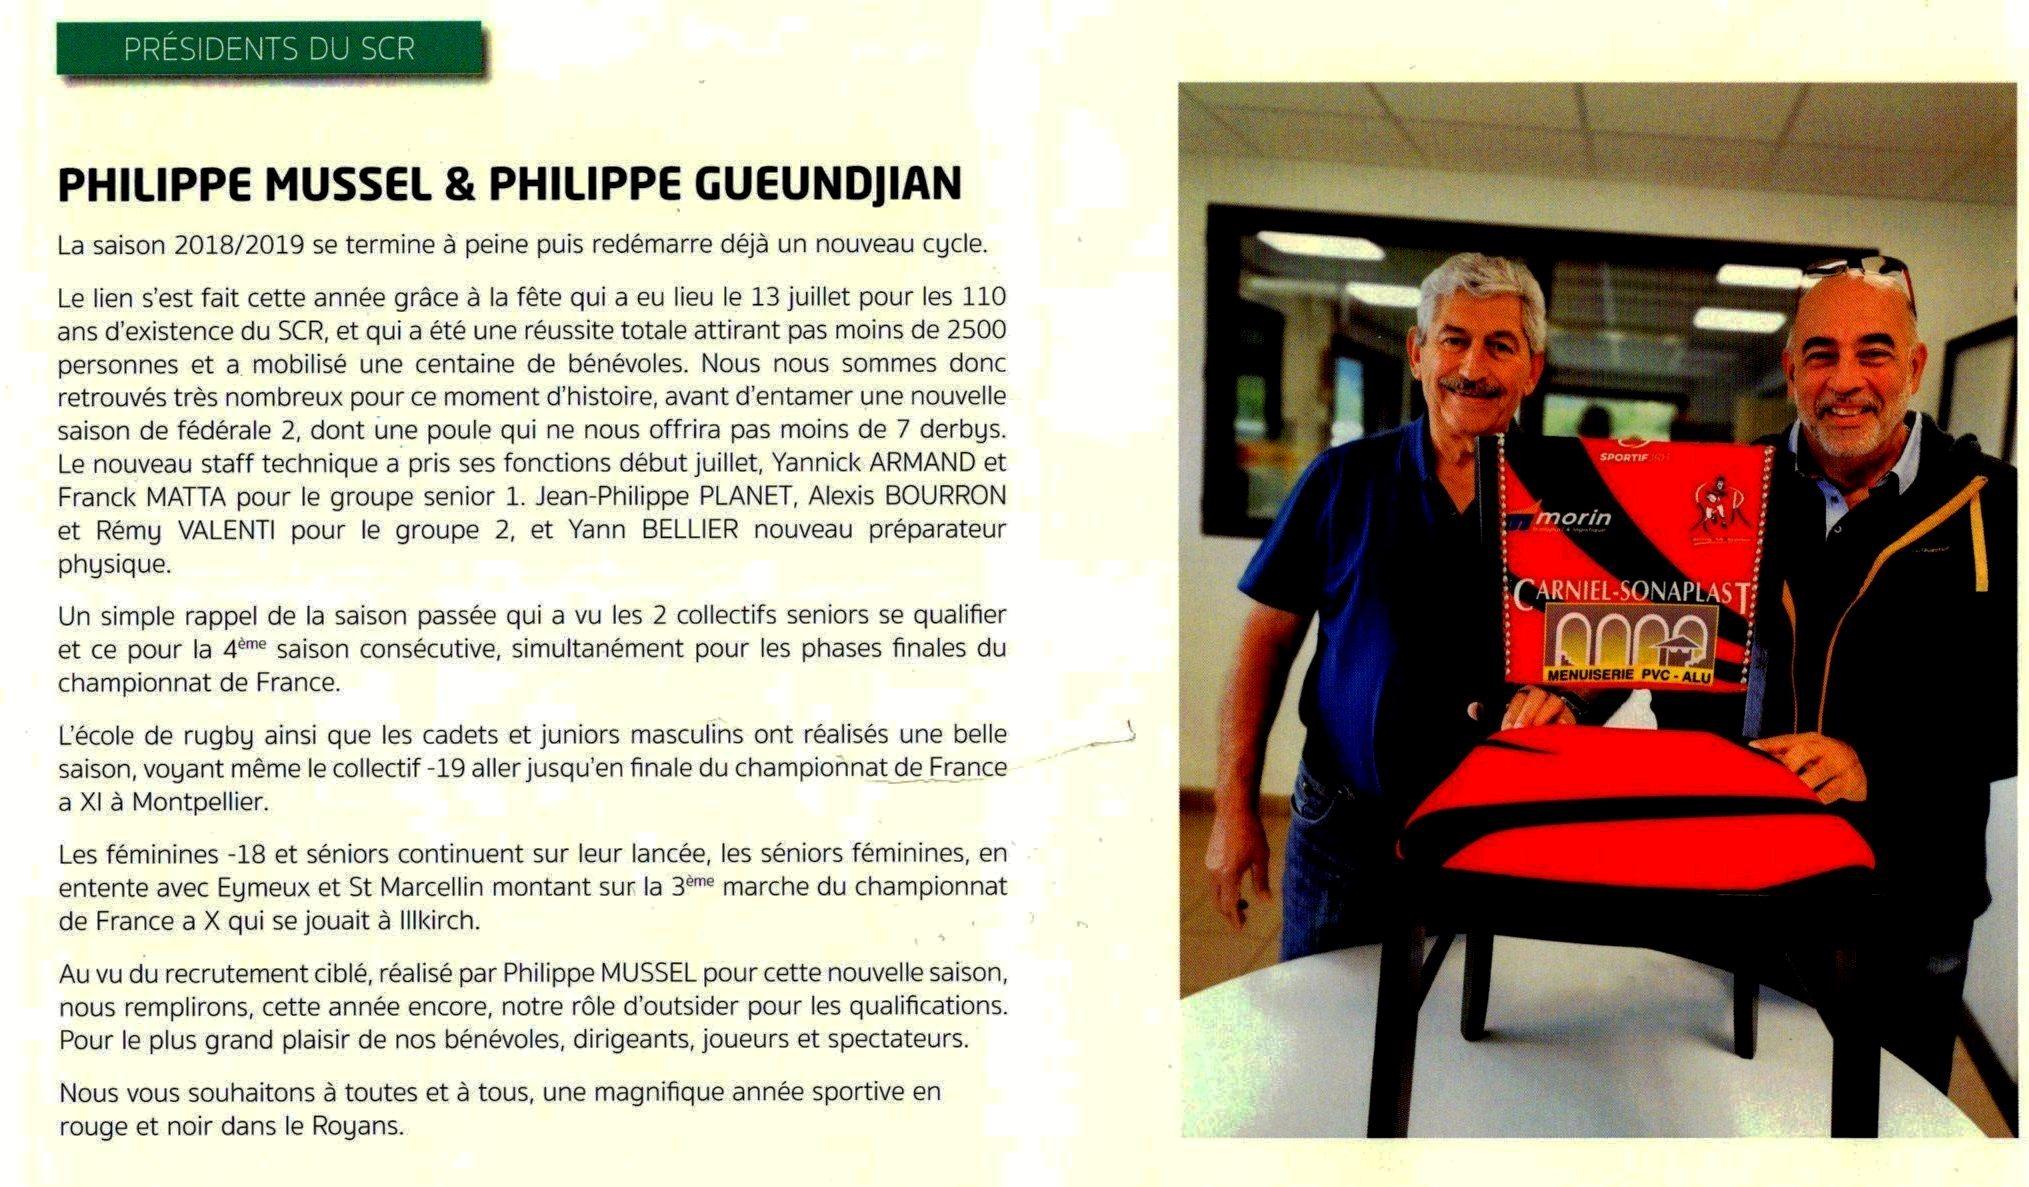 P.Mussel / P.Gueundjian